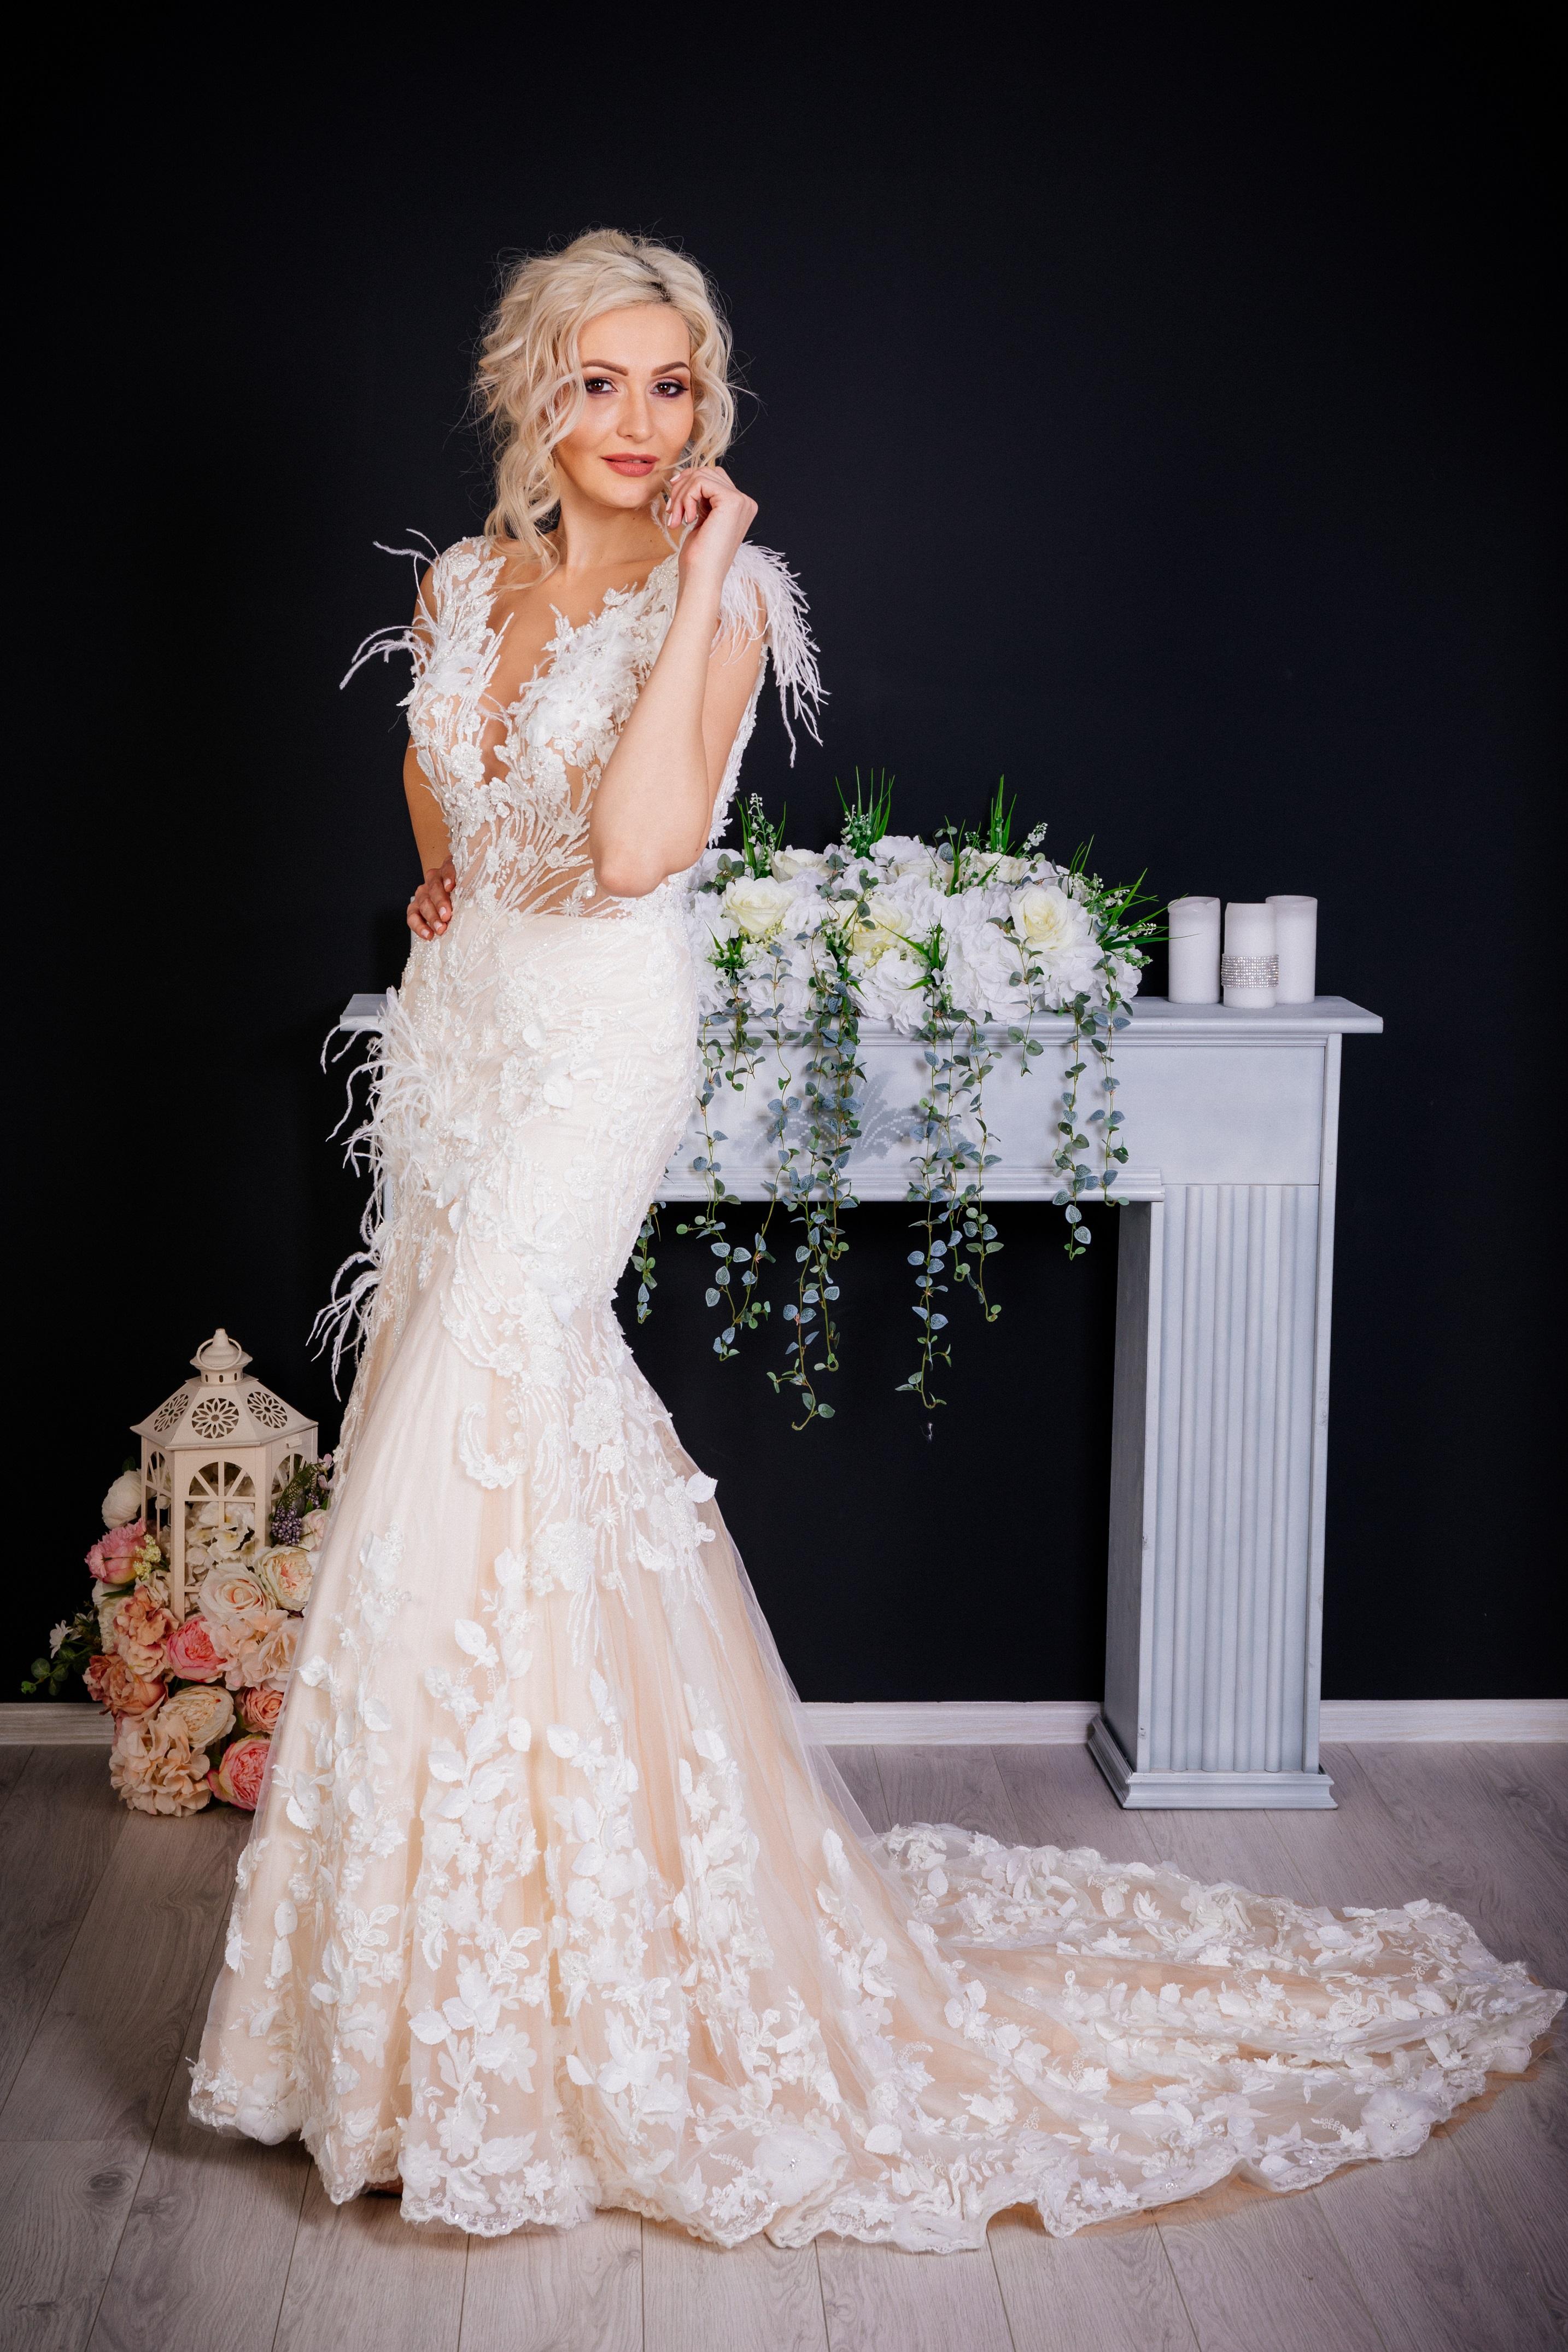 Rochii de mireasa Bucuresti - Anne's Bridal